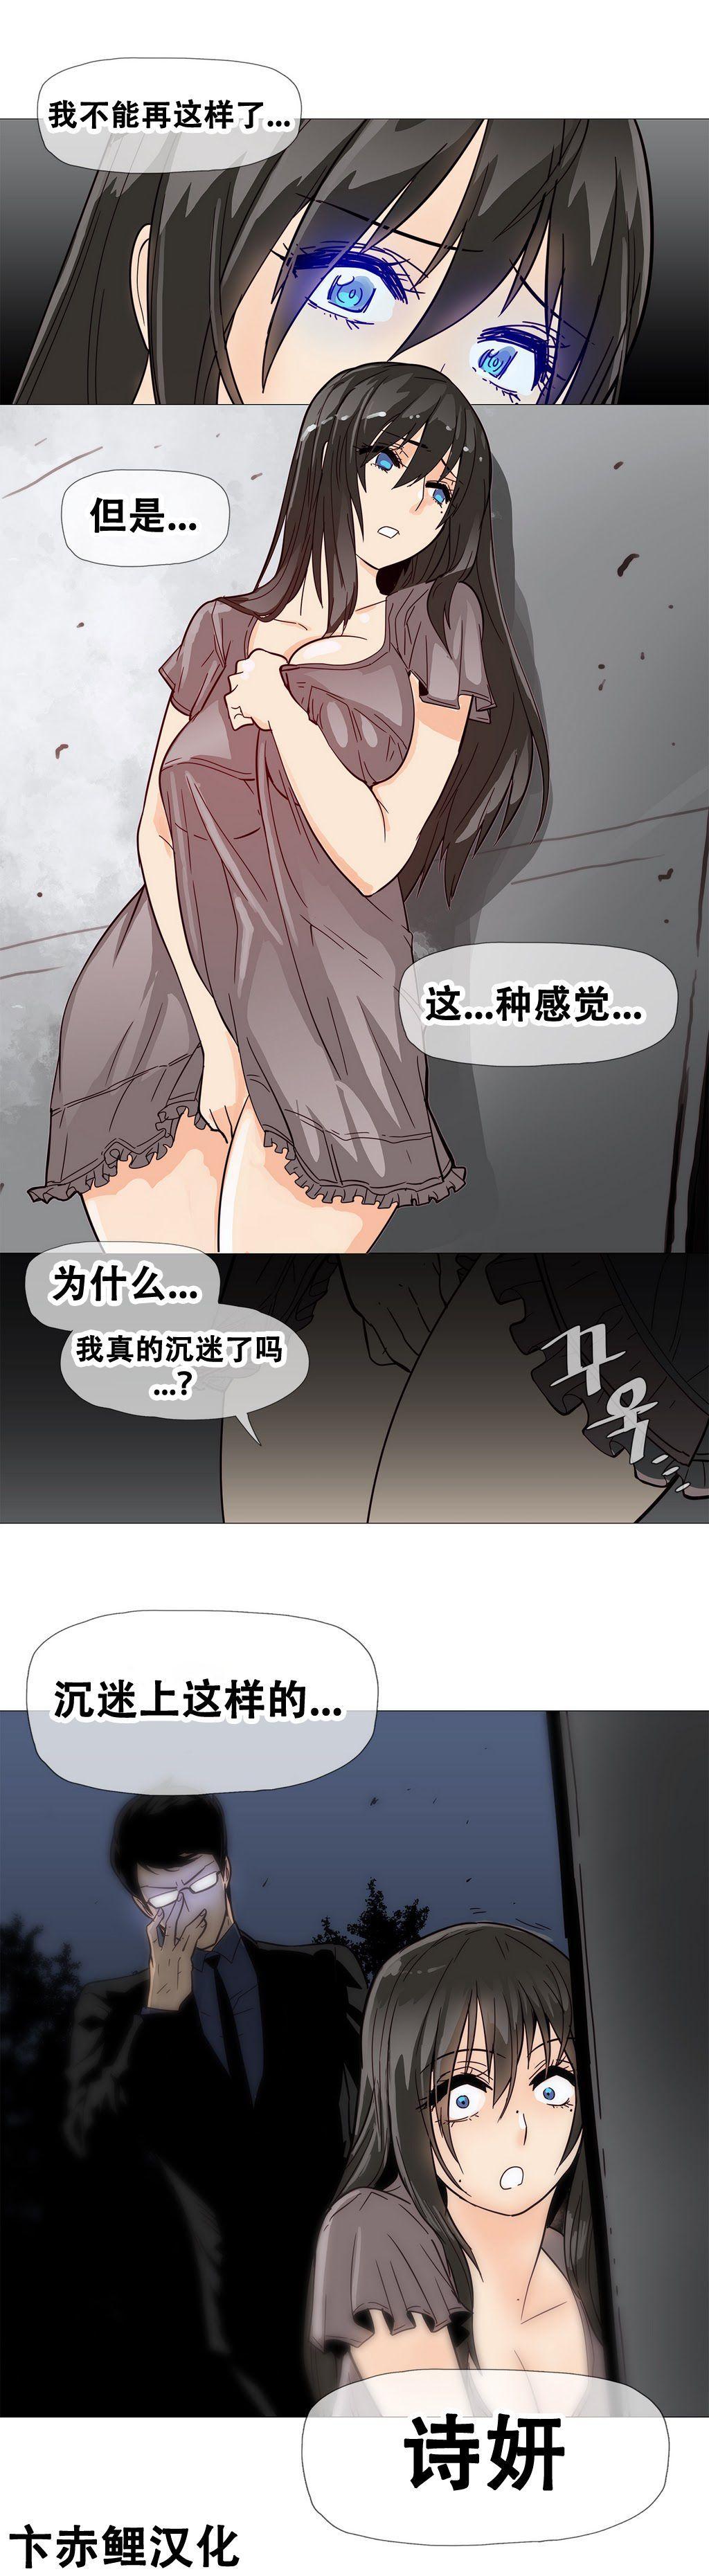 HouseHold Affairs 【卞赤鲤个人汉化】1~33话(持续更新中) 219